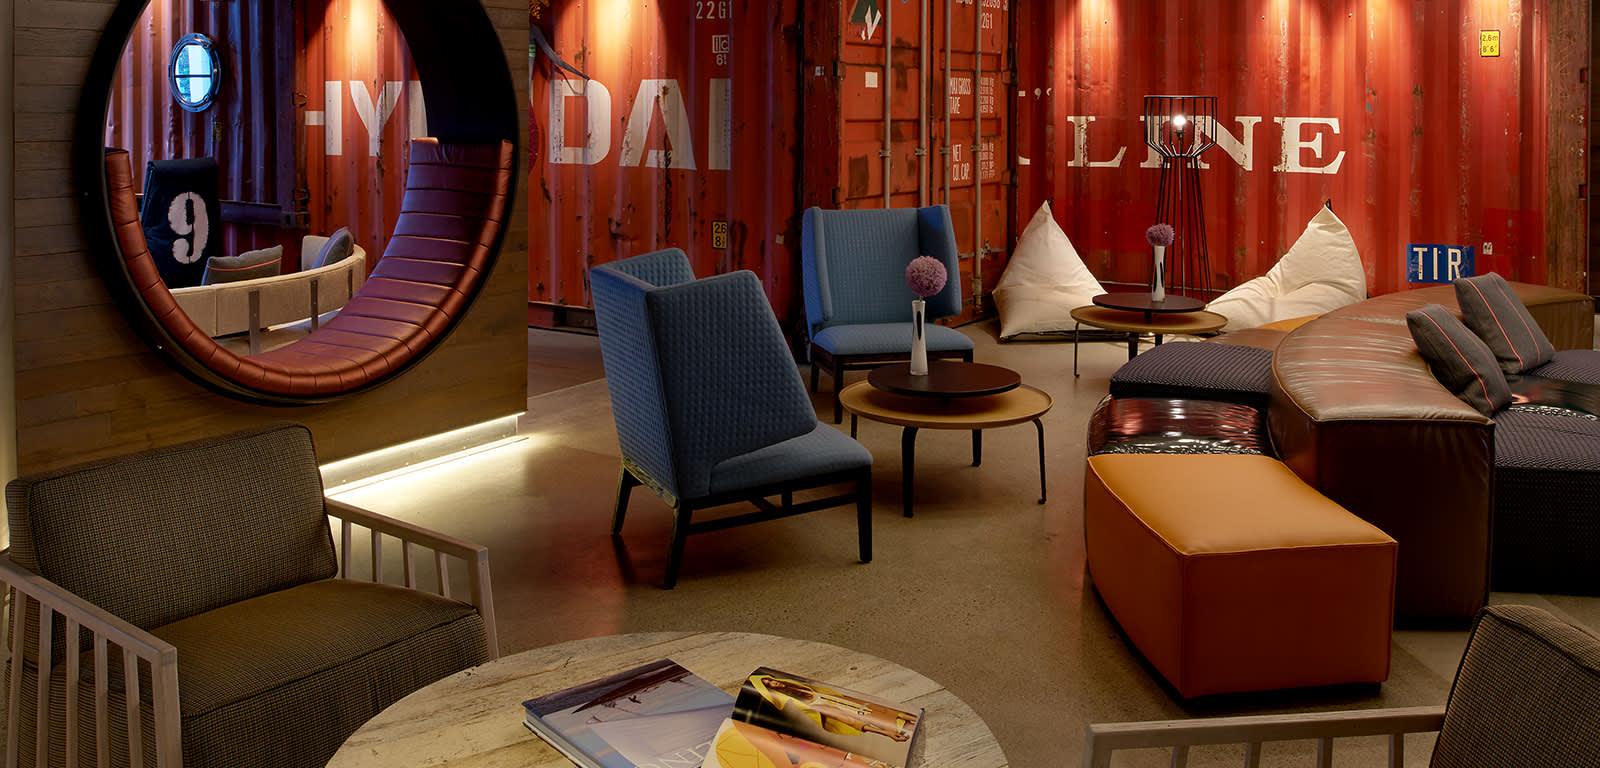 Interior Shot of Lobby Bar at Hotel Zephyr